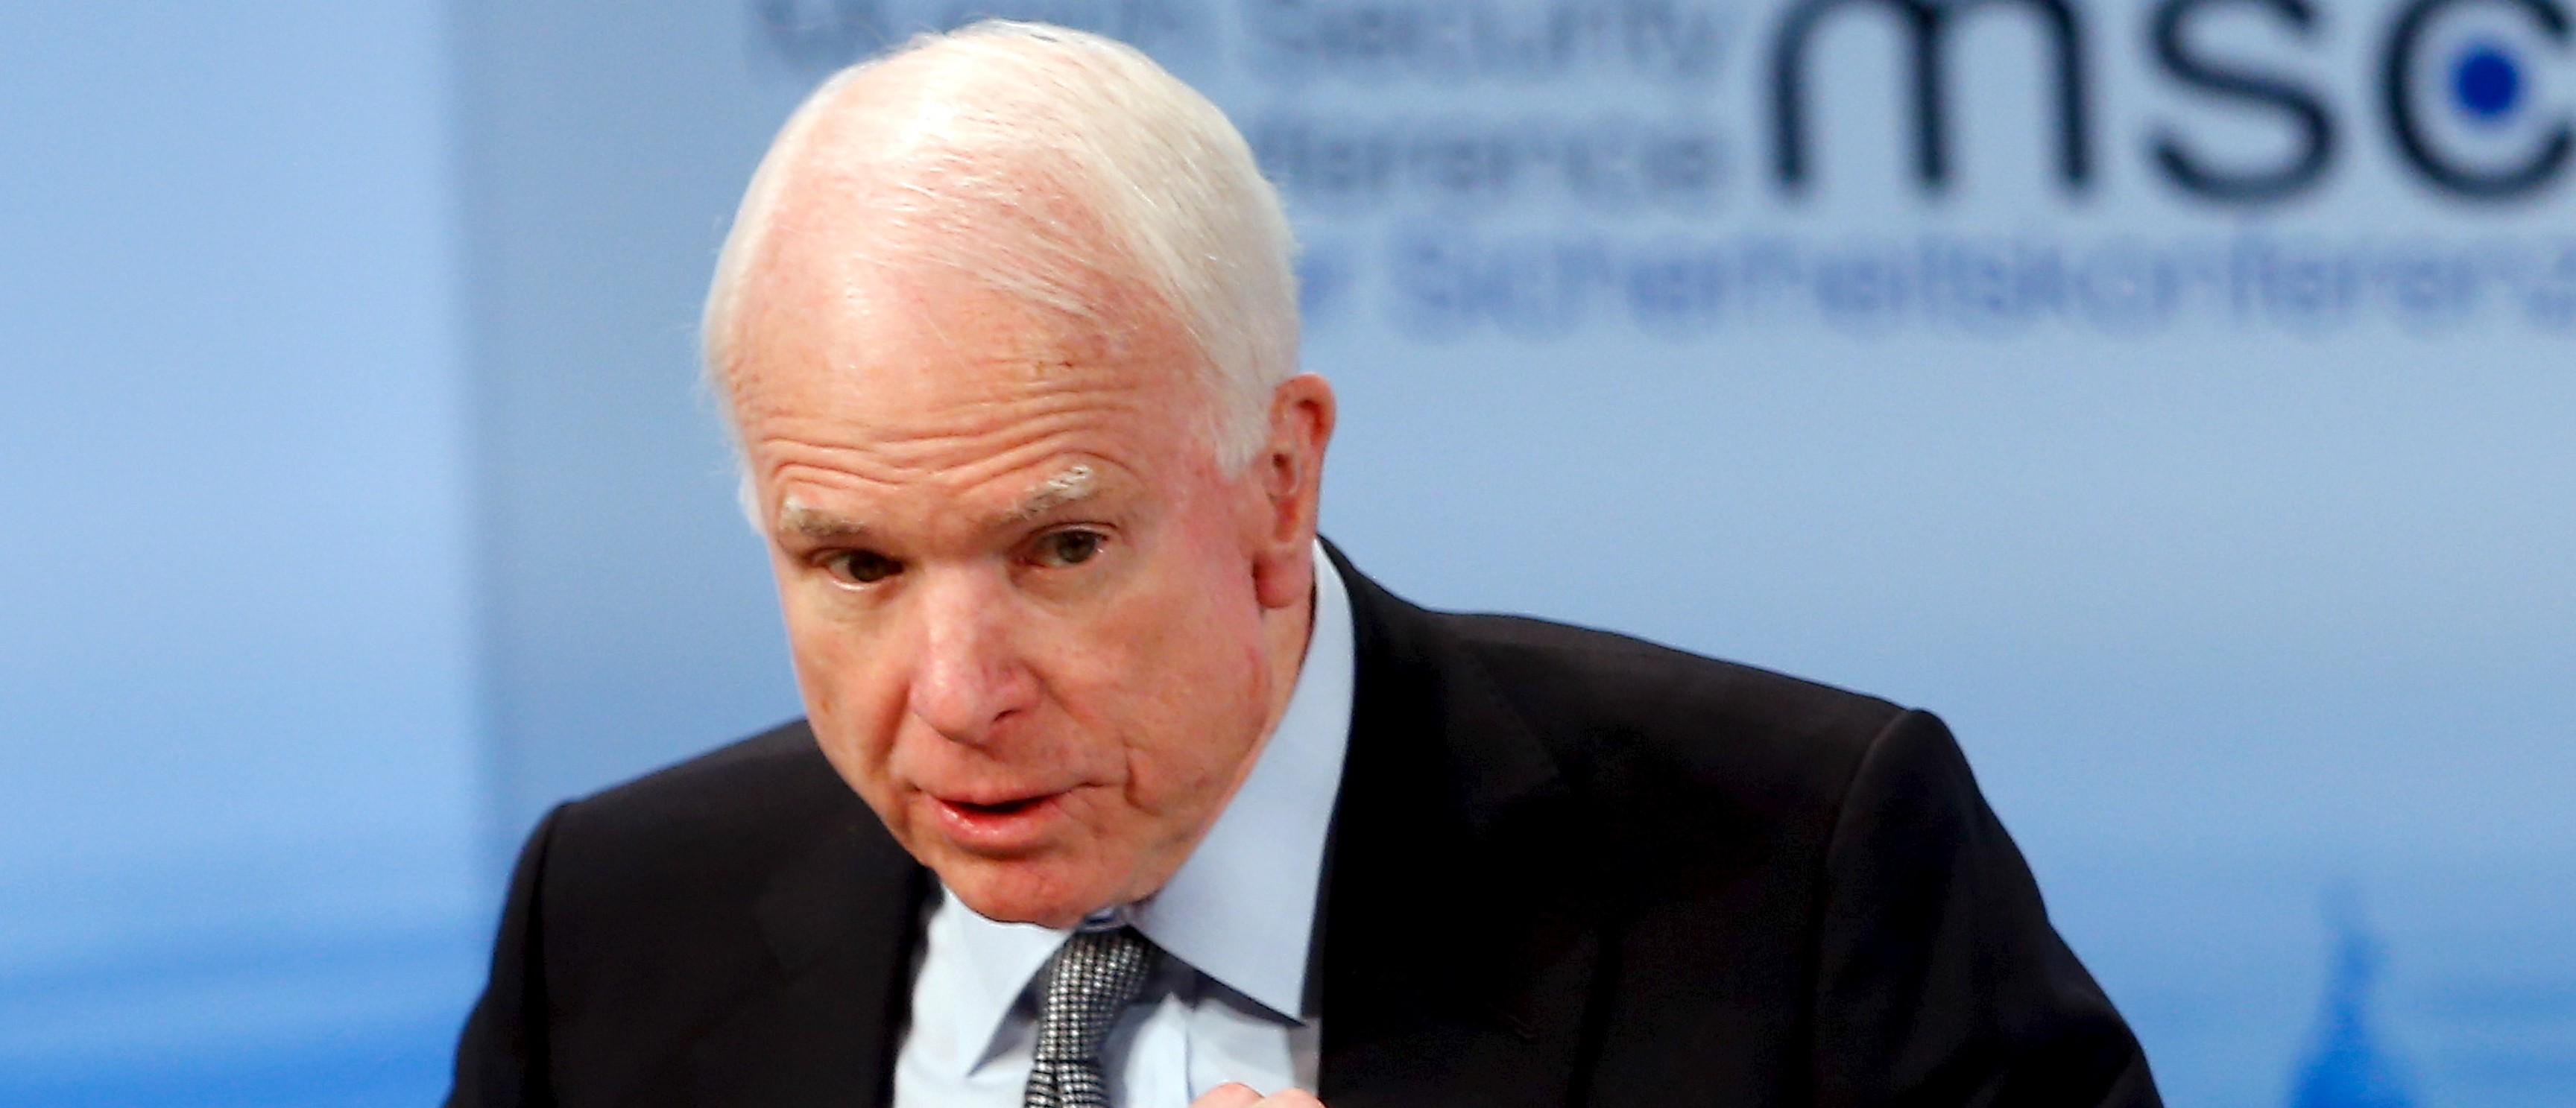 U.S. Senator John McCain speaks at the Munich Security Conference in Munich, Germany, February 14, 2016. REUTERS/Michael Dalder - RTX26UL2